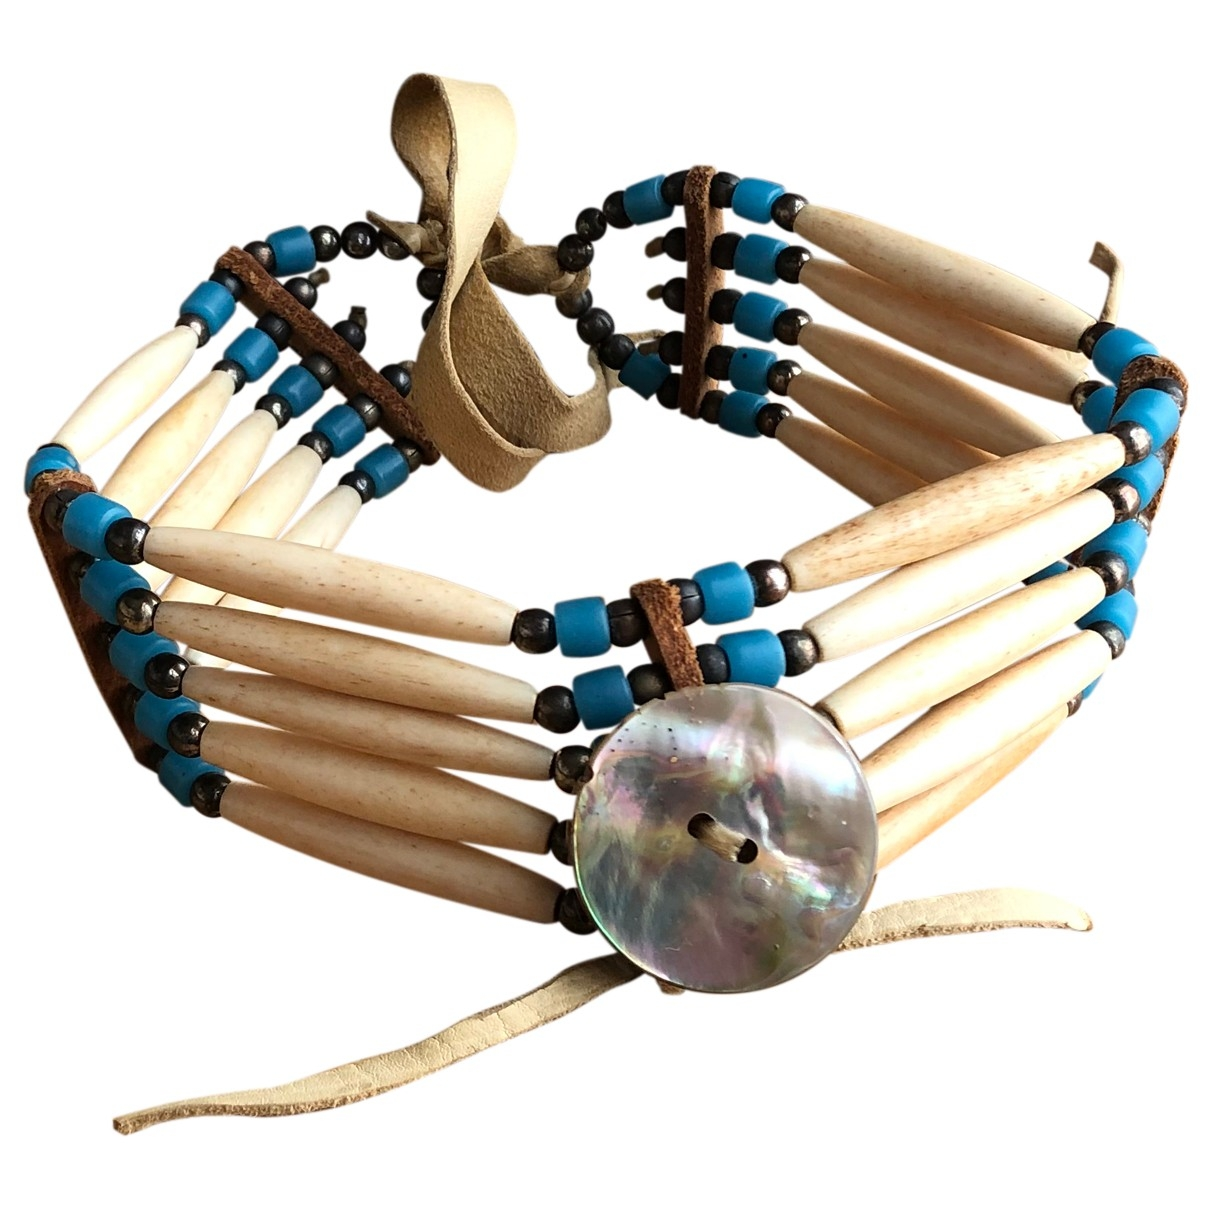 Collar Motifs Ethniques de Cuero Non Signe / Unsigned